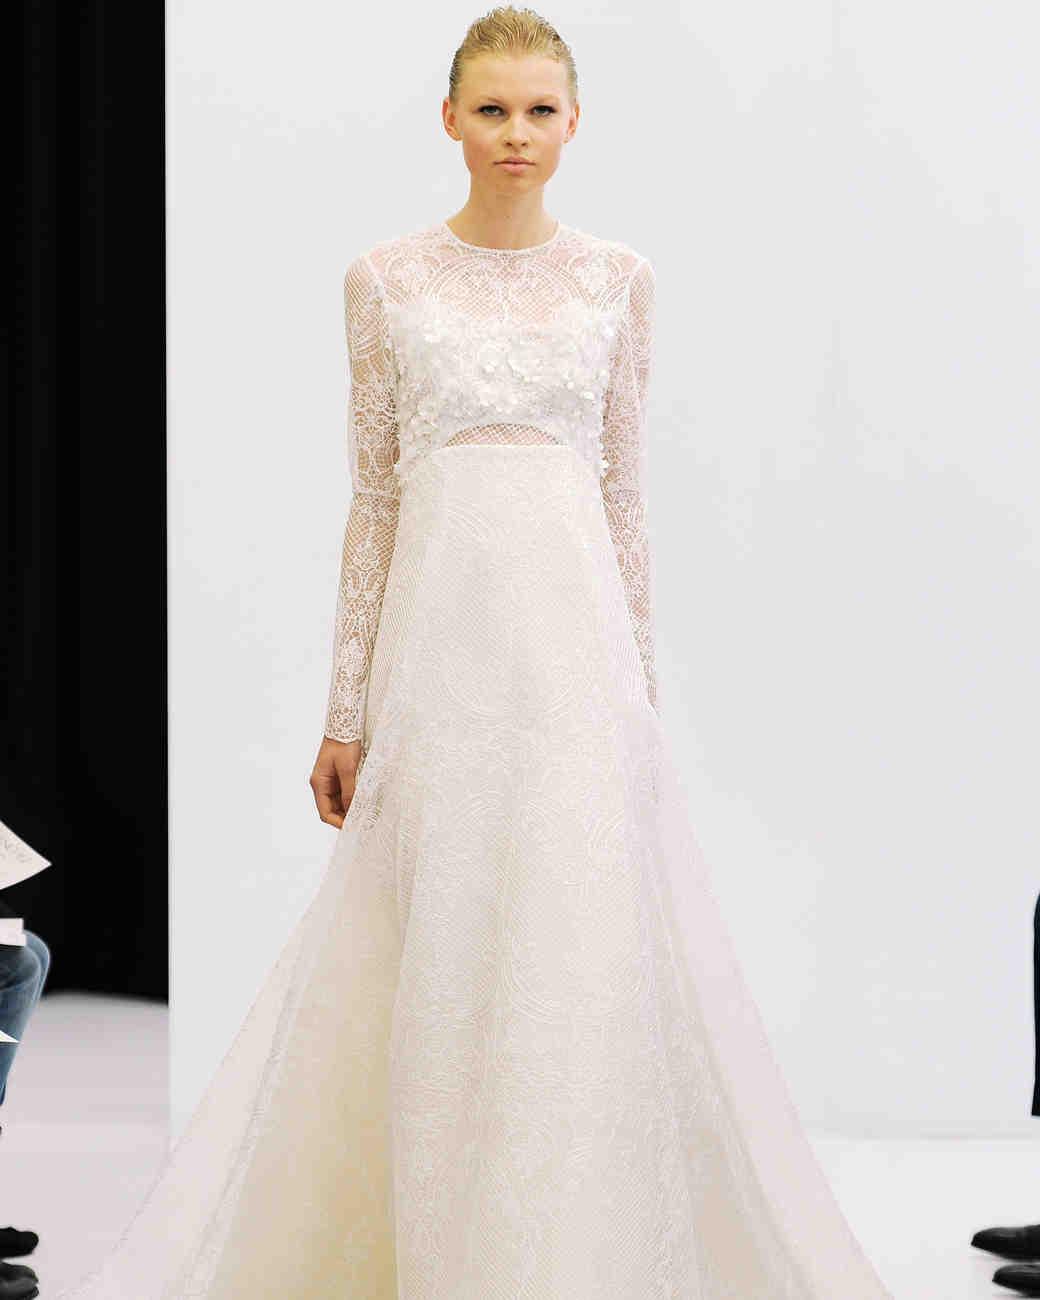 martha stewart wedding dresses photo - 1